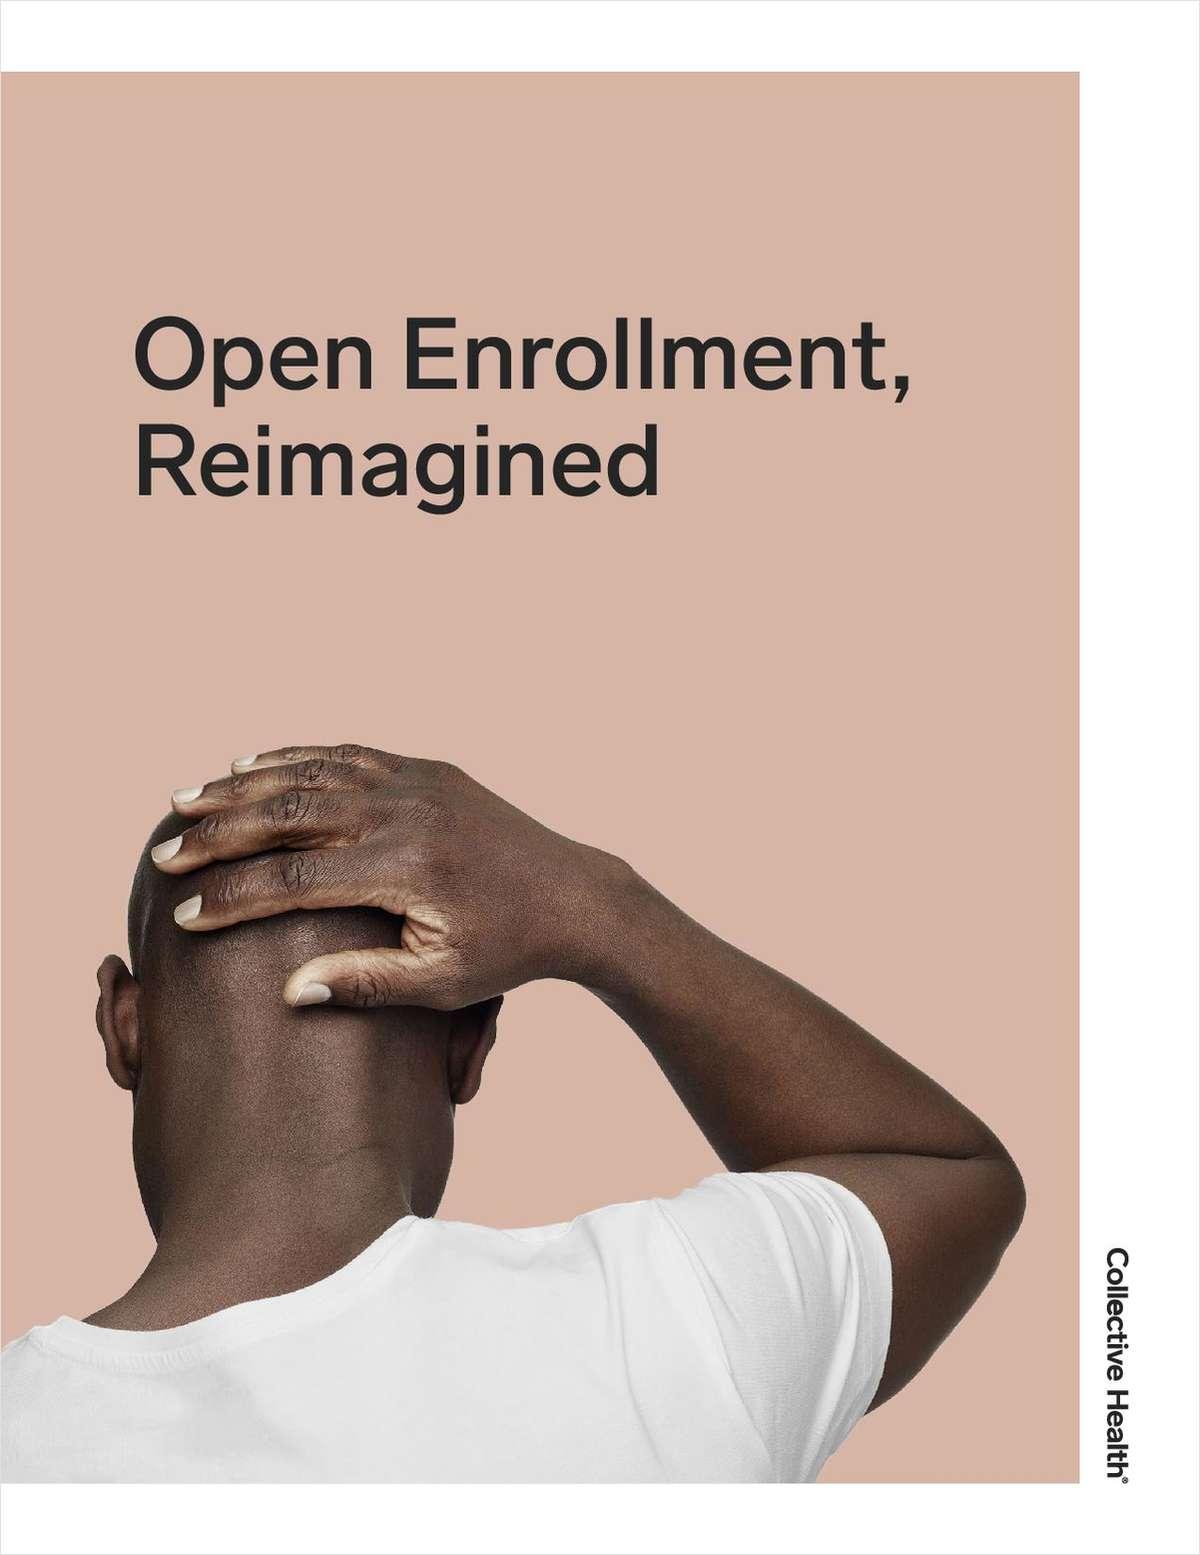 Open Enrollment, Reimagined